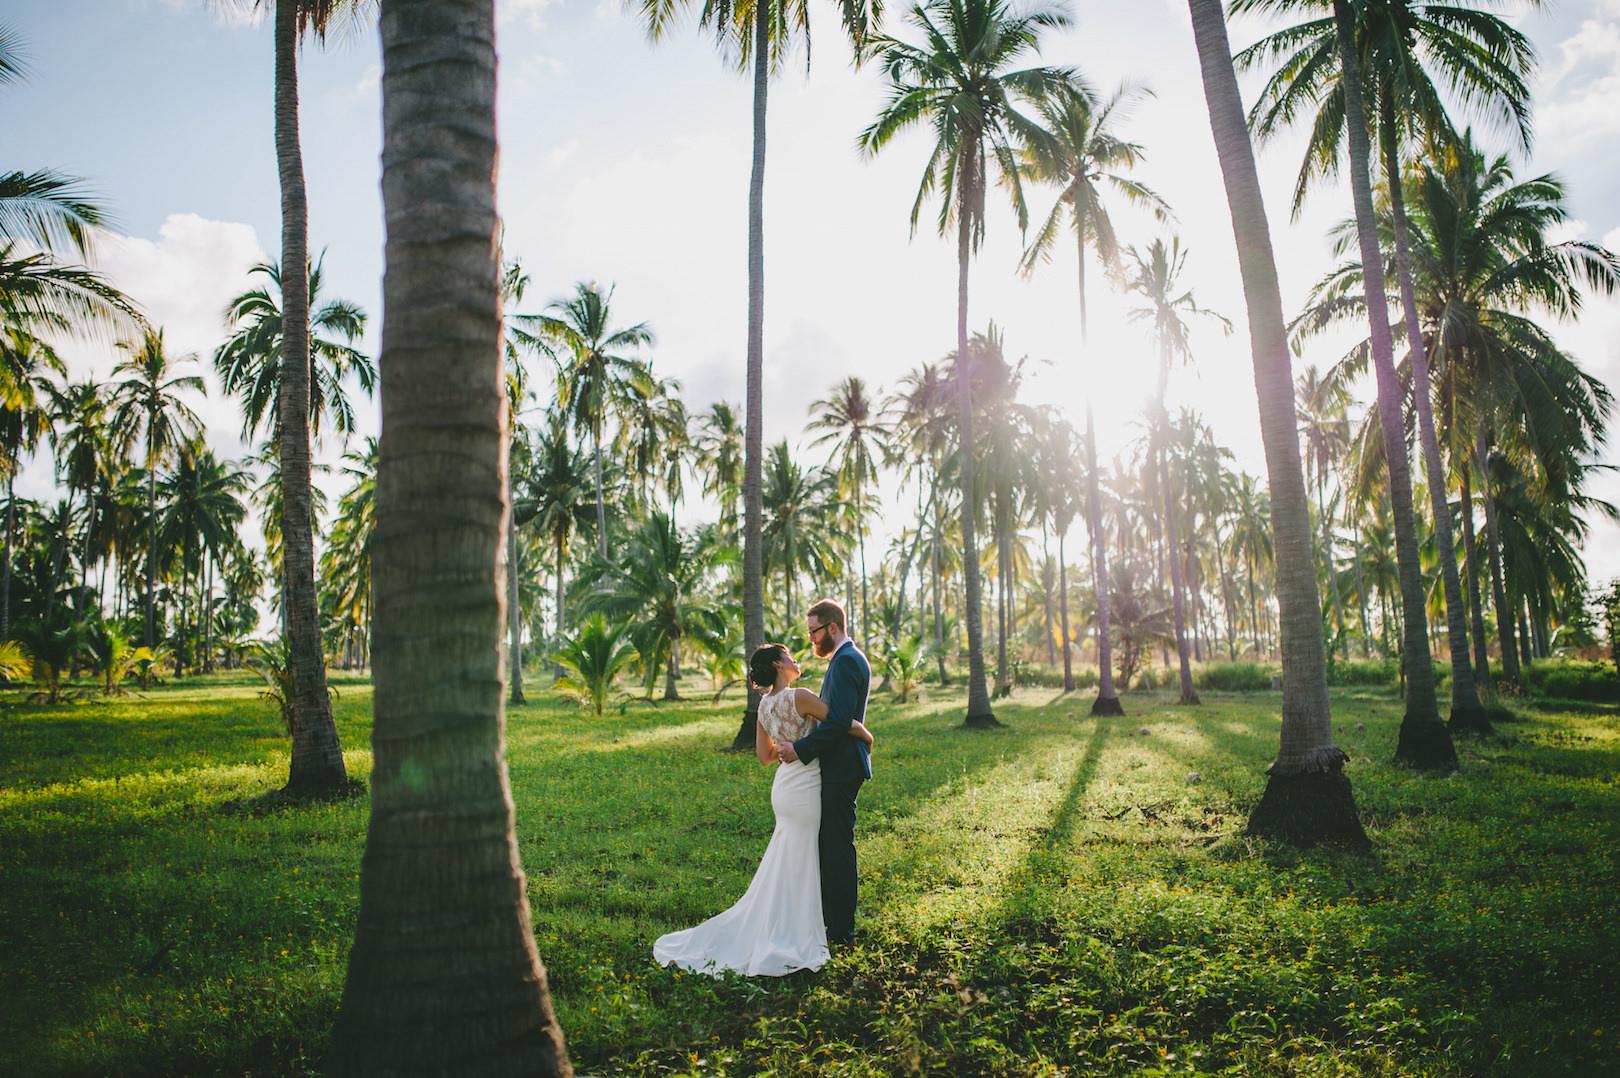 Nathan & Felicia - Wedding Day - © Dallas Kolotylo Photography - 485